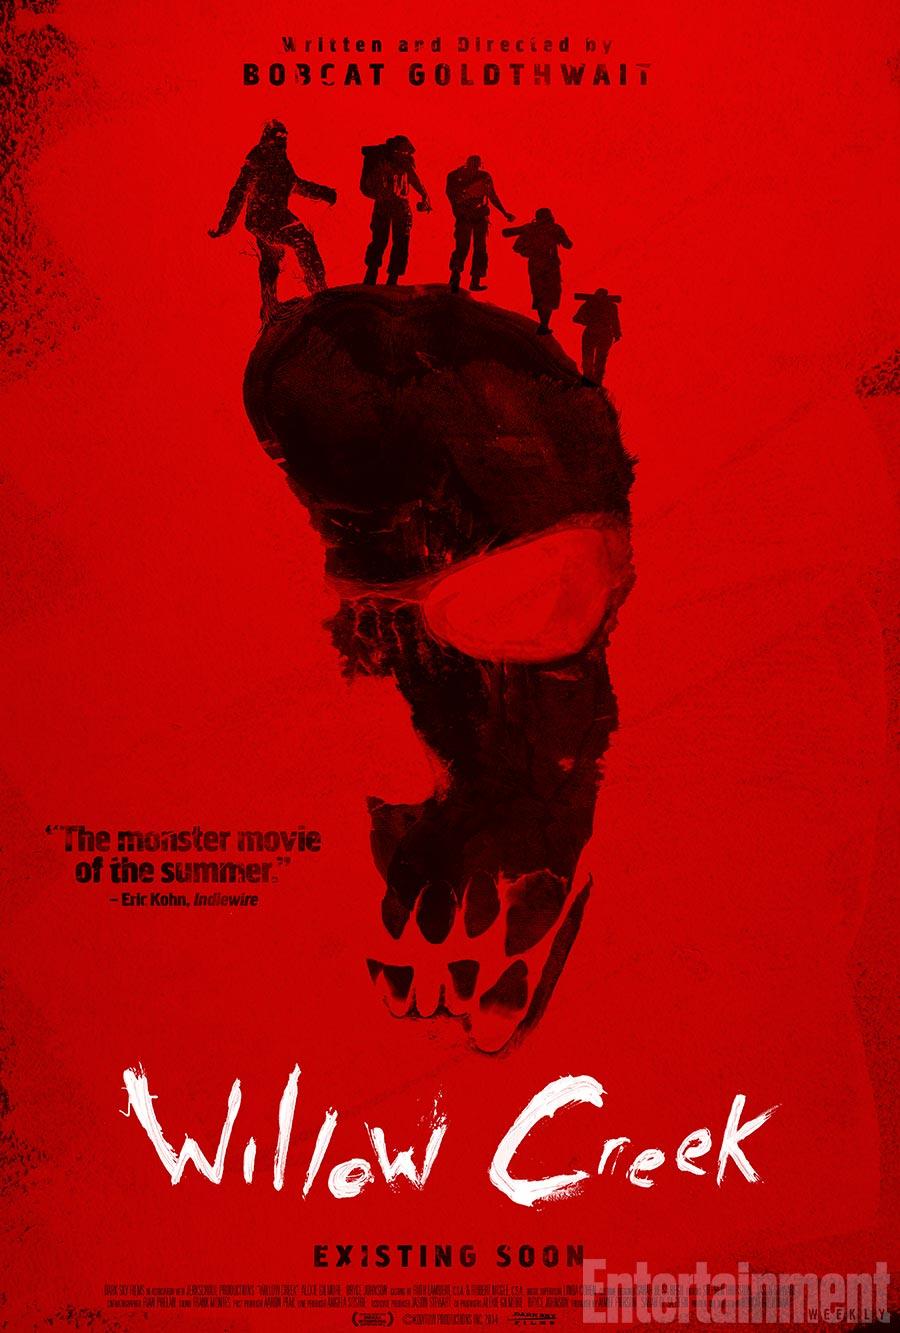 Willow Creek (2014, dir. BobcatGoldthwait)